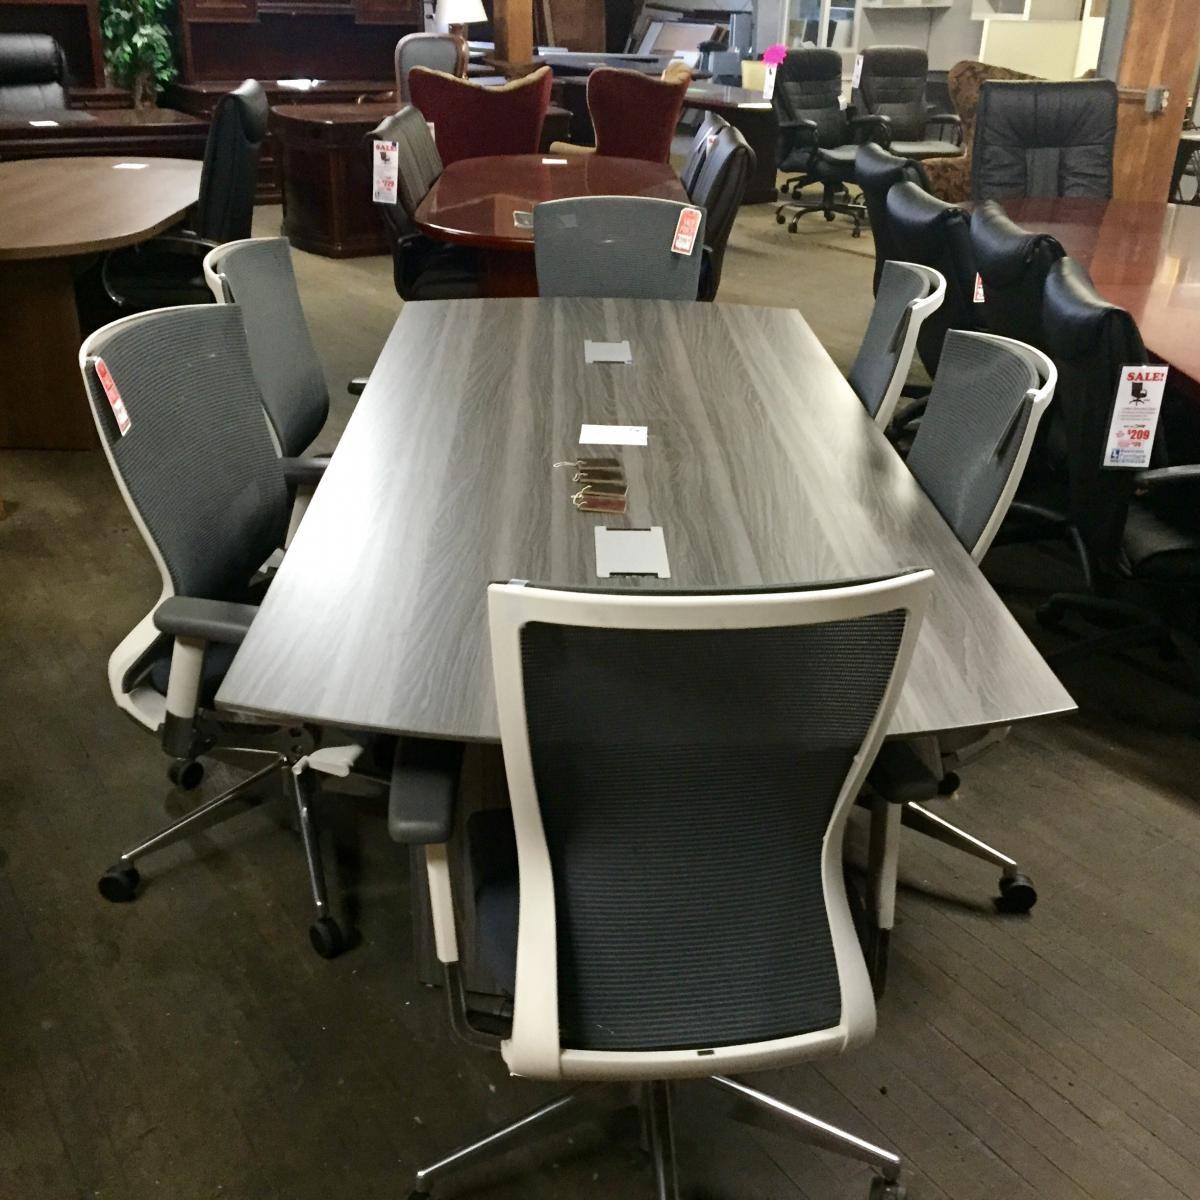 Mayline Medina Conference Table With Cherryman IDESK Orblanco Chairs - Medina conference table